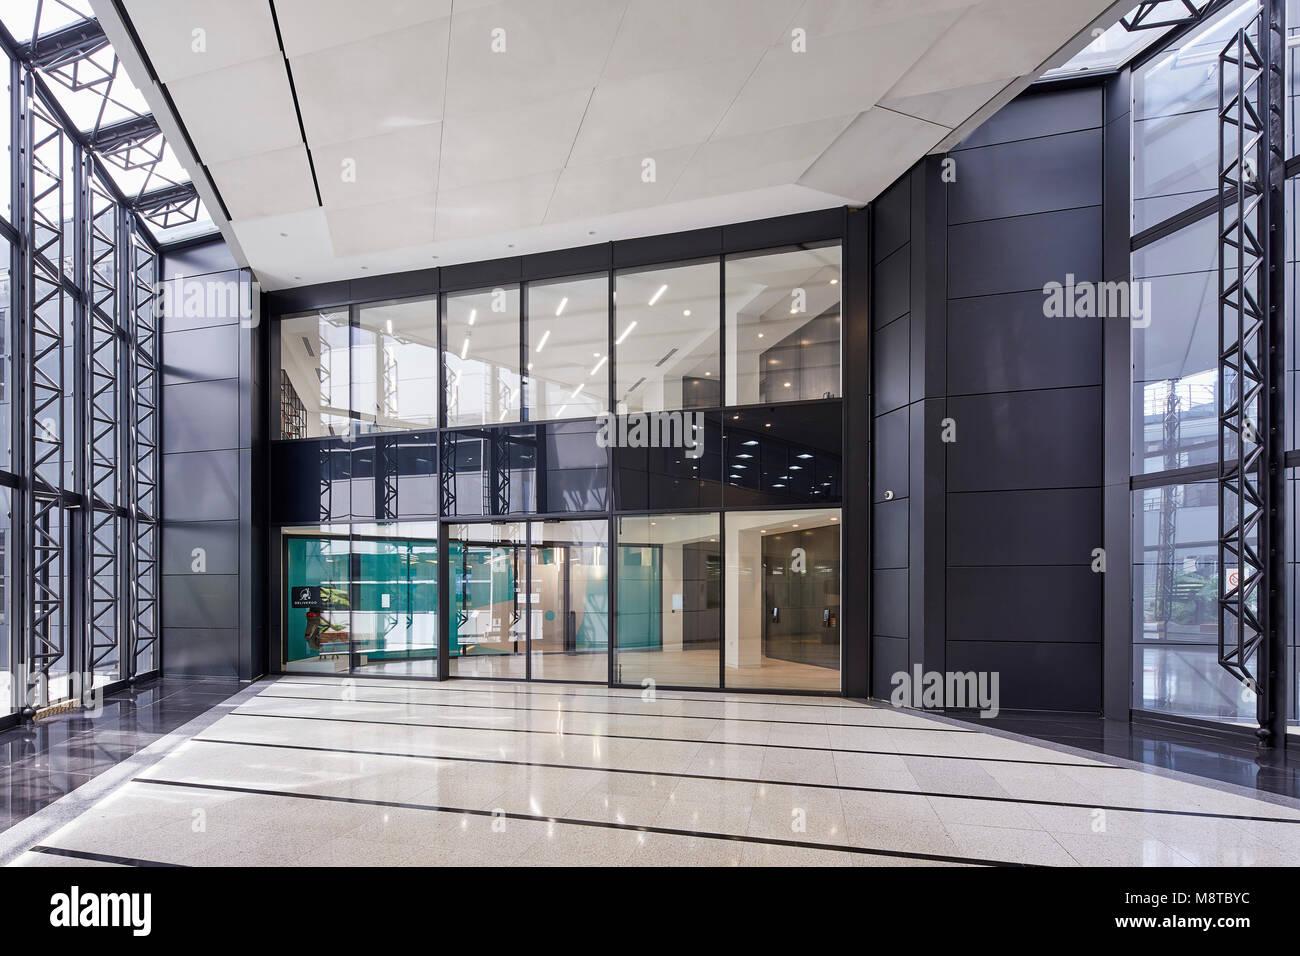 Interior view. The River Building, London, United Kingdom. Architect: Stiff + Trevillion Architects, 2017. - Stock Image